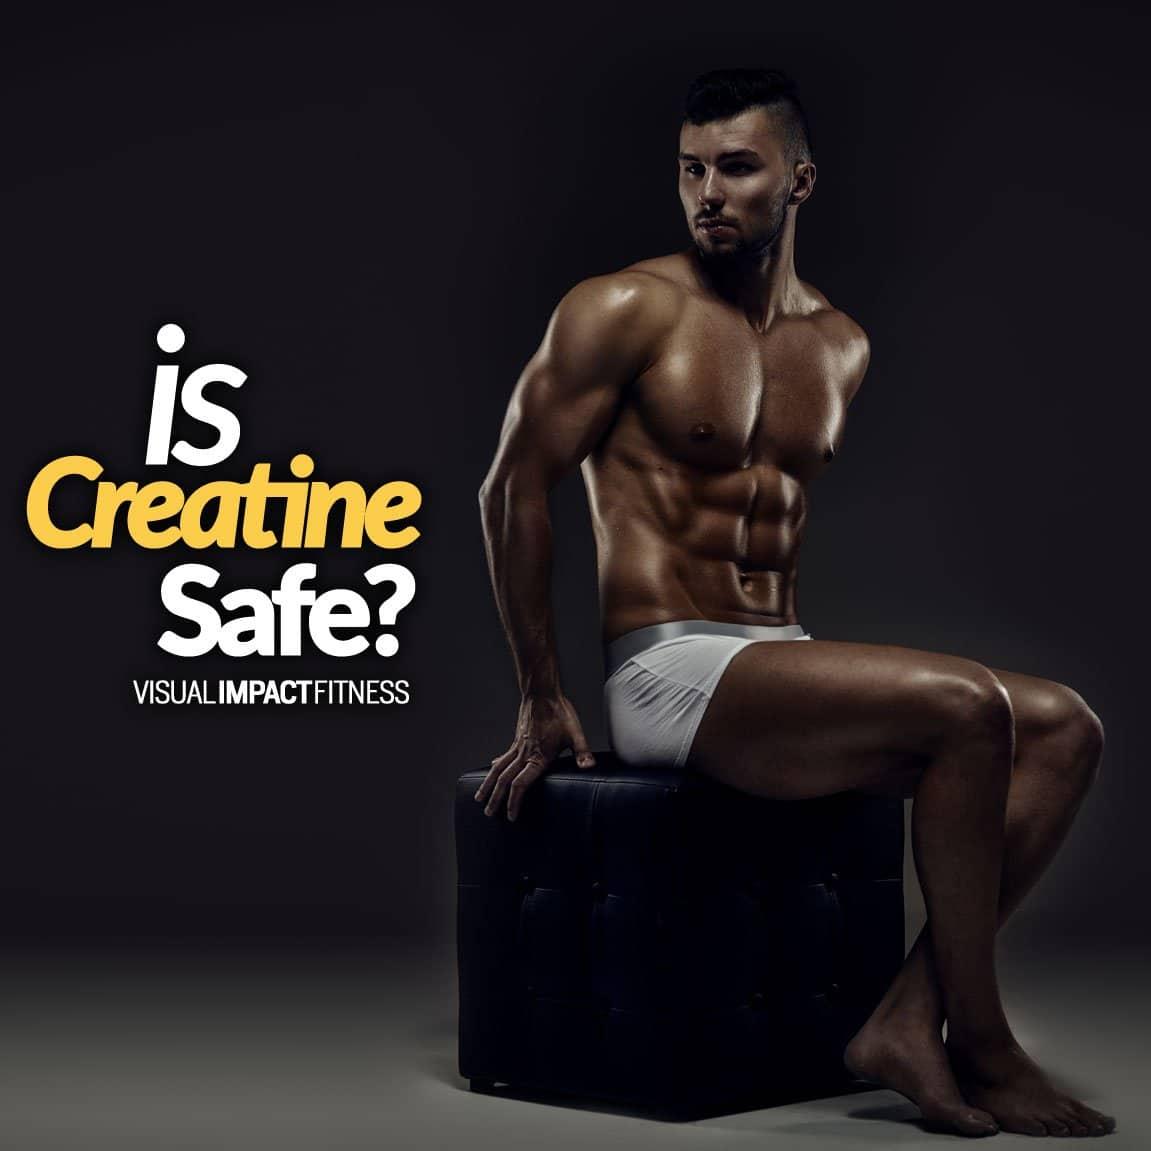 Is Creatine Safe